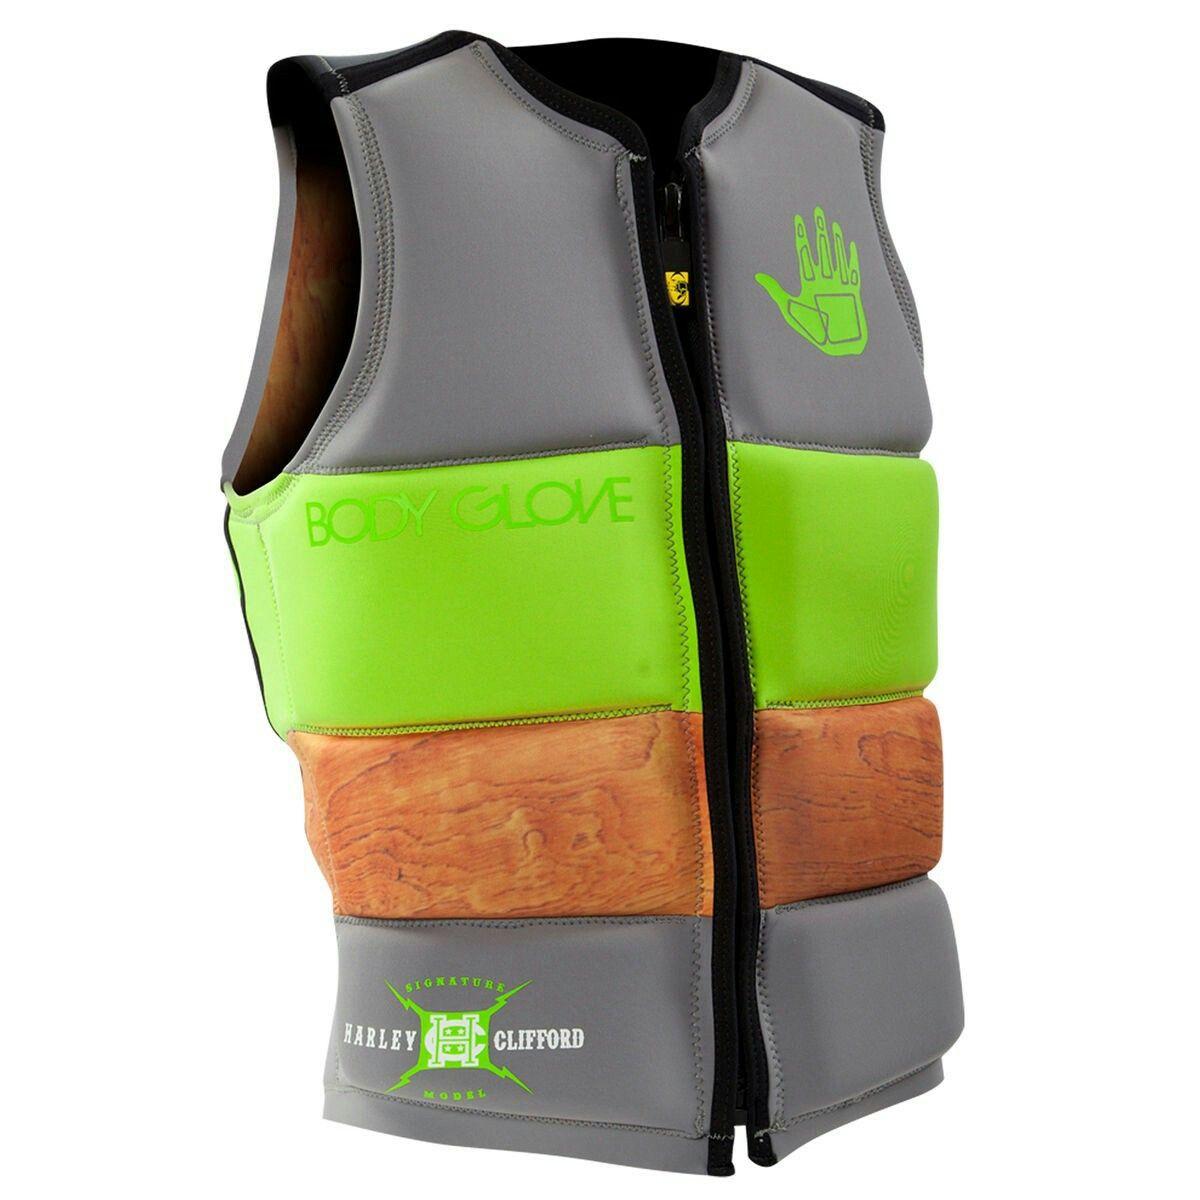 Body glove harley cliff body glove life jacket comp